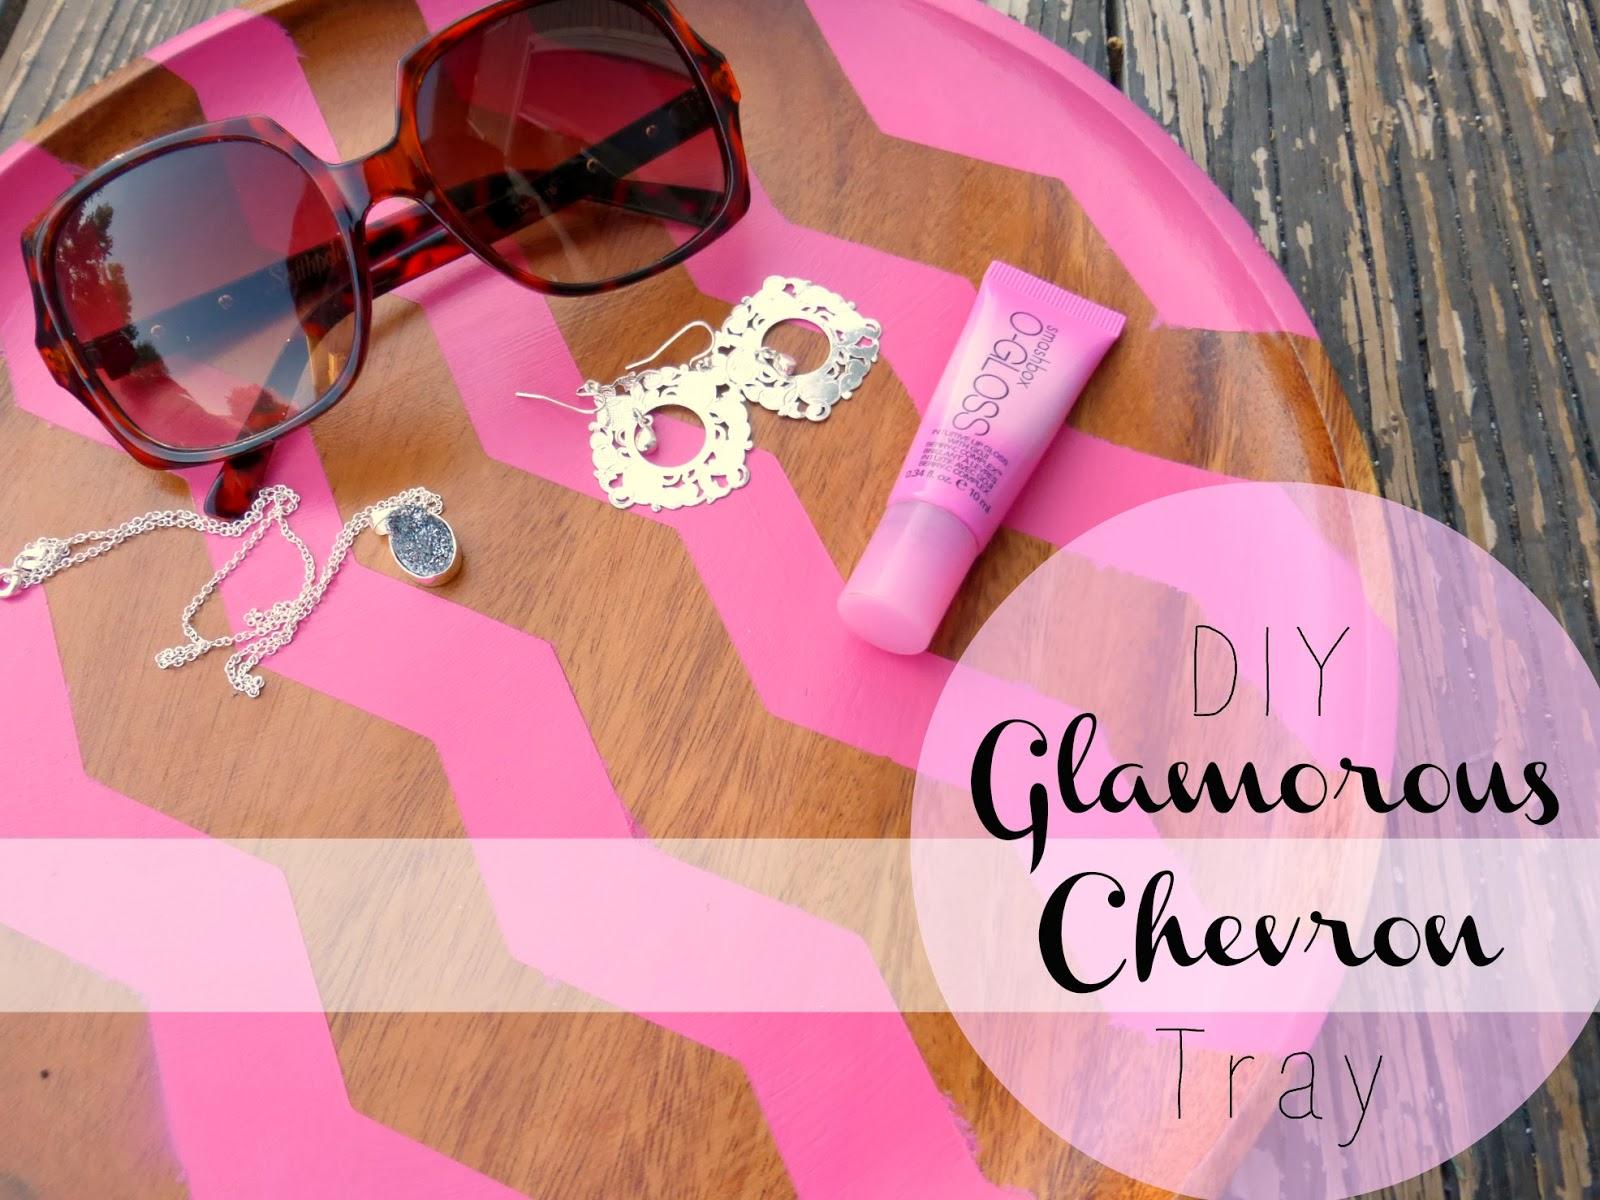 http://www.domesticblisssquared.com/2013/10/diy-galmorous-pink-chevron-tray.html